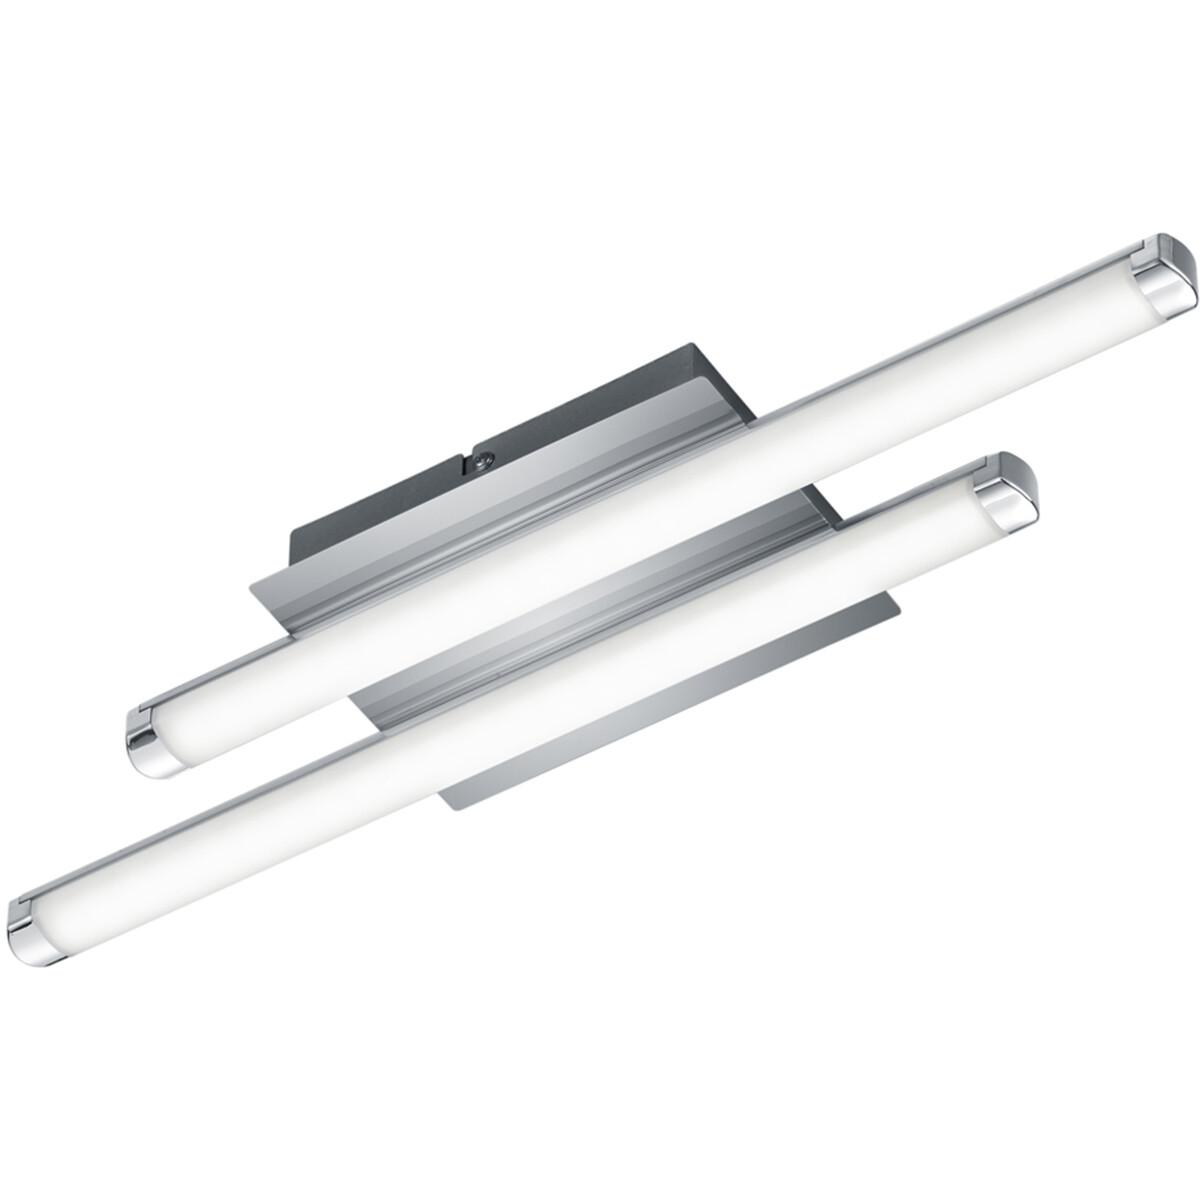 LED Plafondlamp - Plafondverlichting - Trion Staton - 8W - Warm Wit 3000K - Rechthoek - Mat Wit - Al